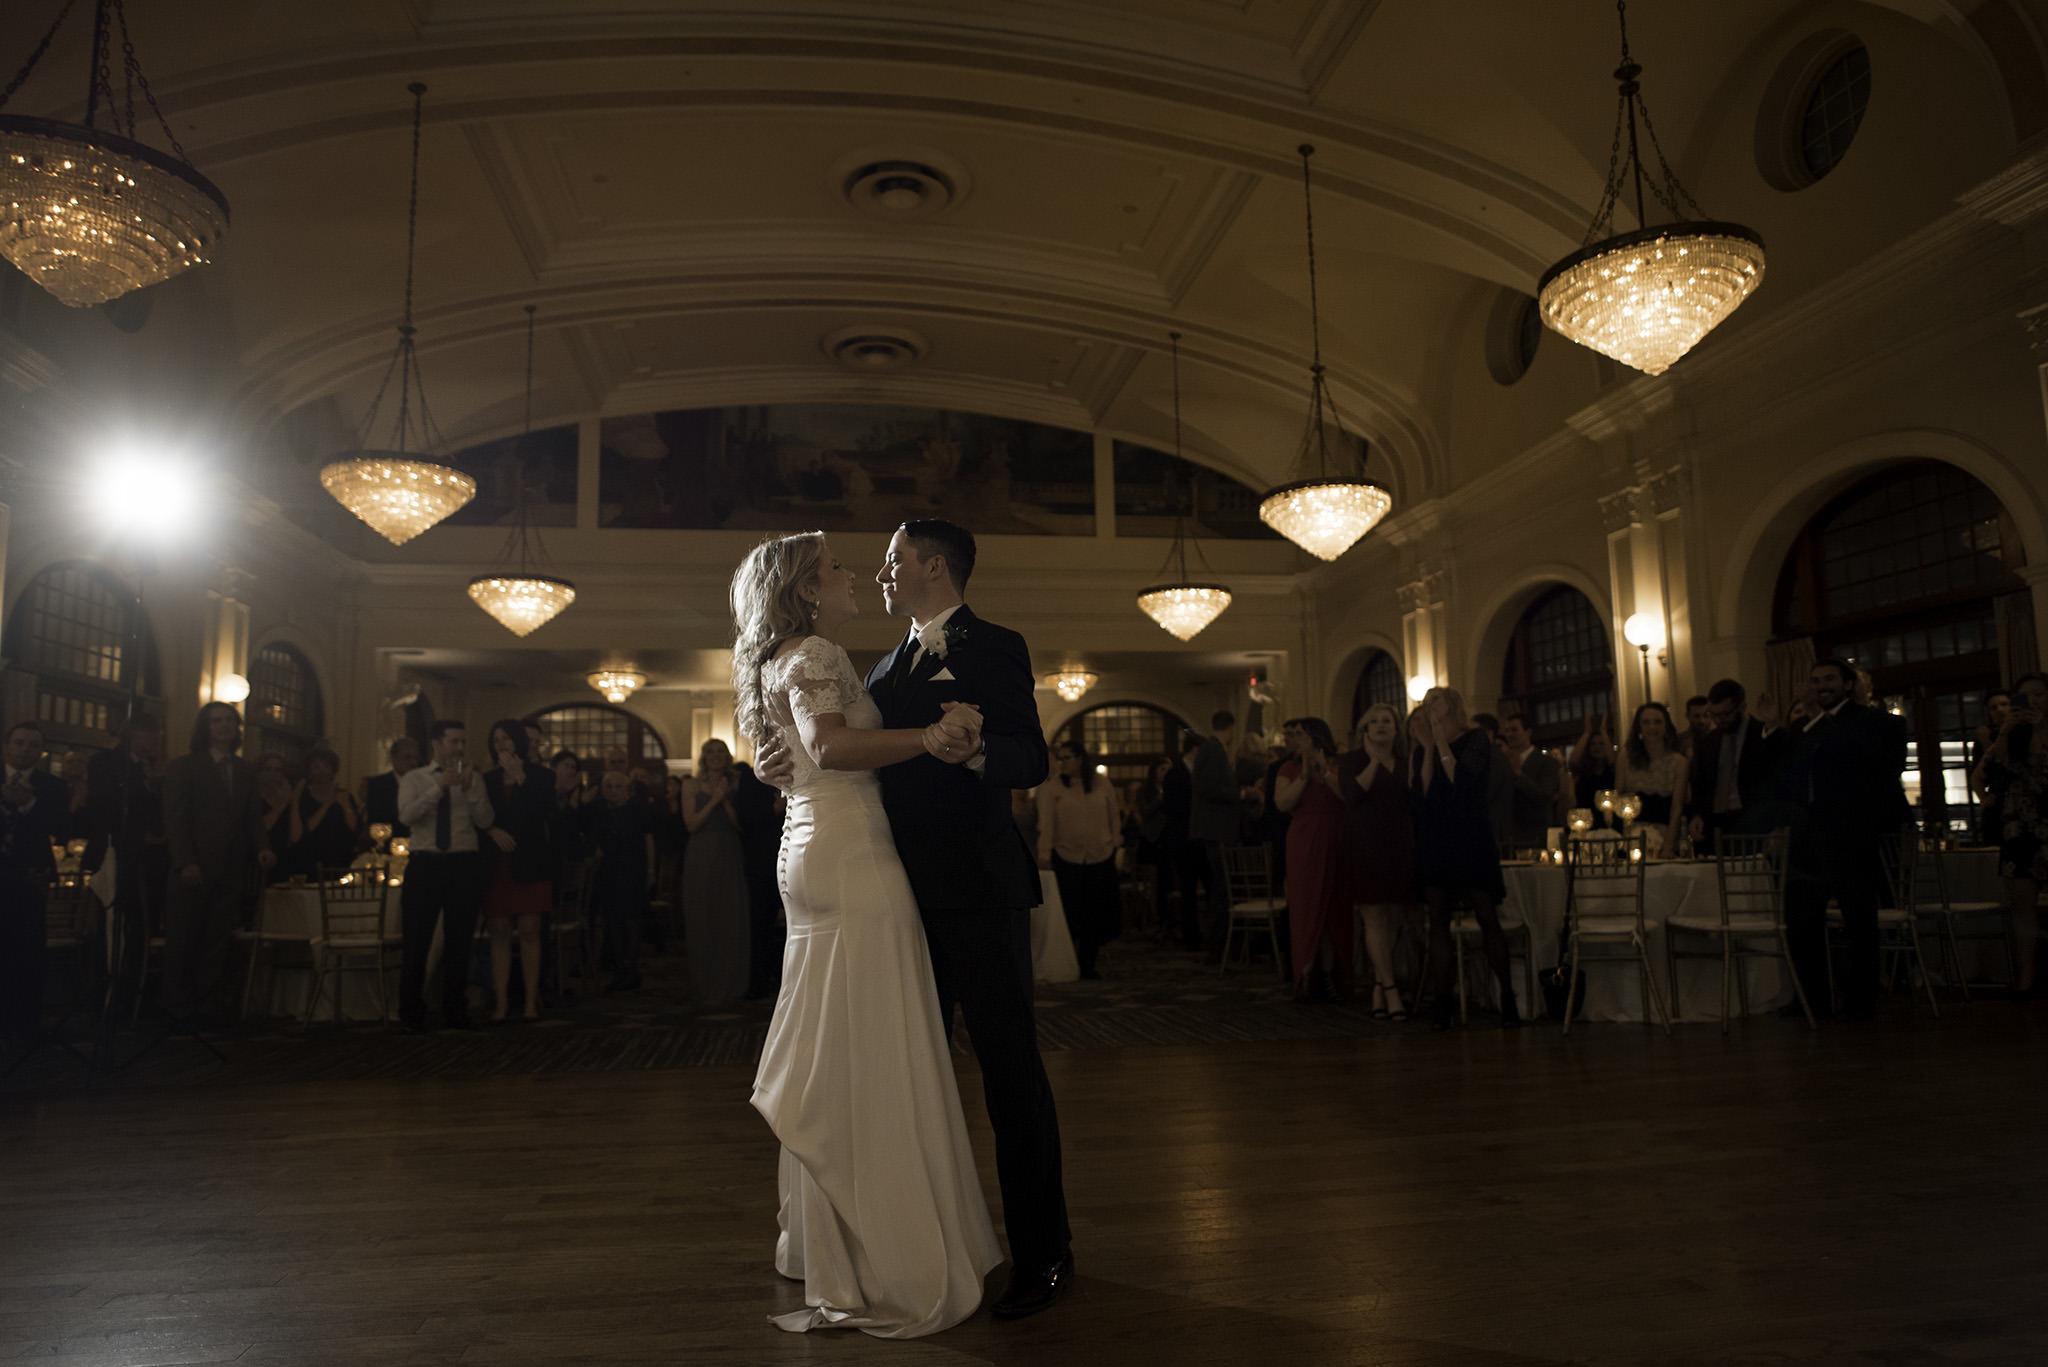 Claire-Travis-Classy-artistic-Downtown-Houston-Rice-ballroom-wedding-sm-022.jpg